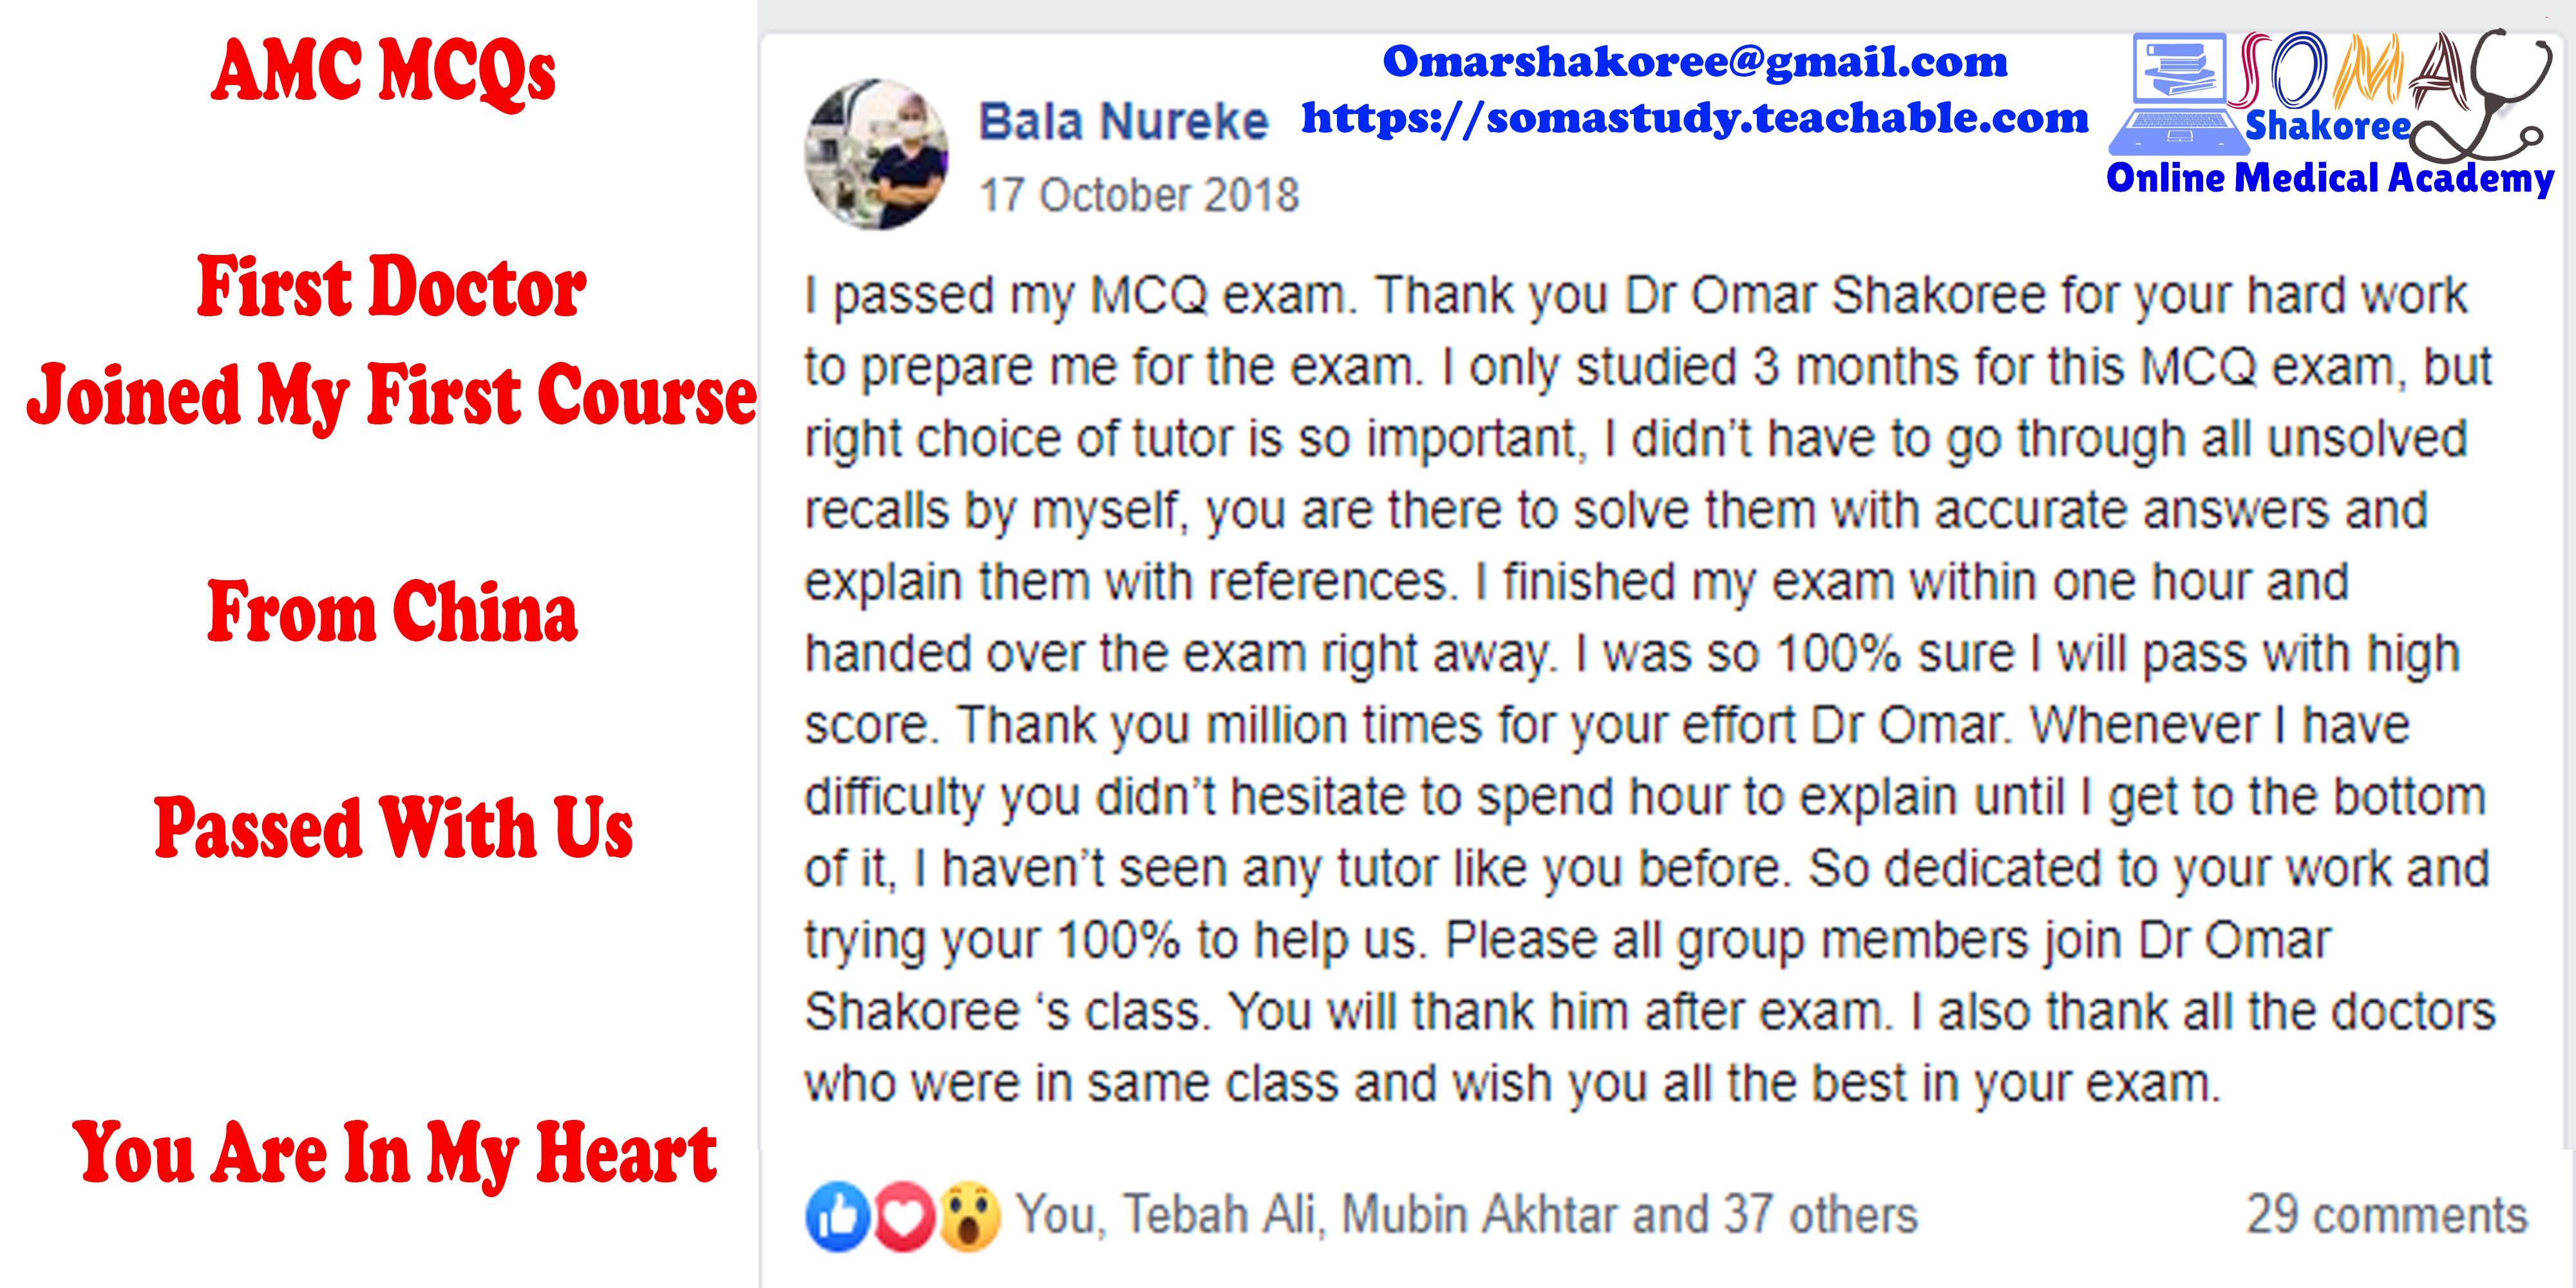 Full Cover Course AMC MCQ Preparation | Shakoree Online Medical